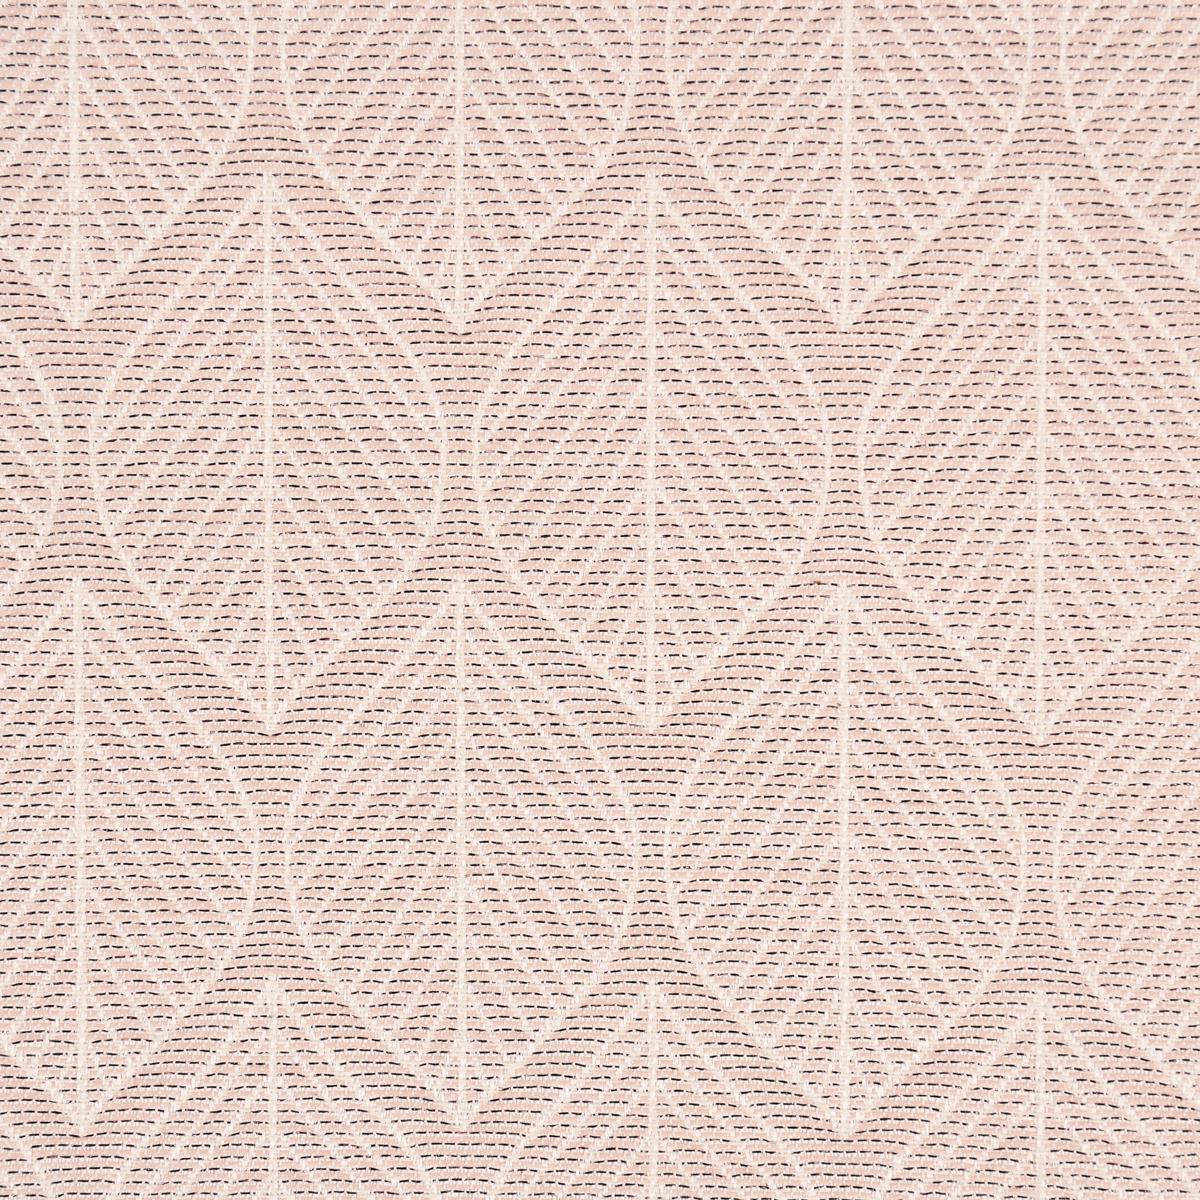 Dekostoff Jacquard Doubleface Premium Metallic Leaf Retro Scandi Blätter rosa beige 1,4m Breite